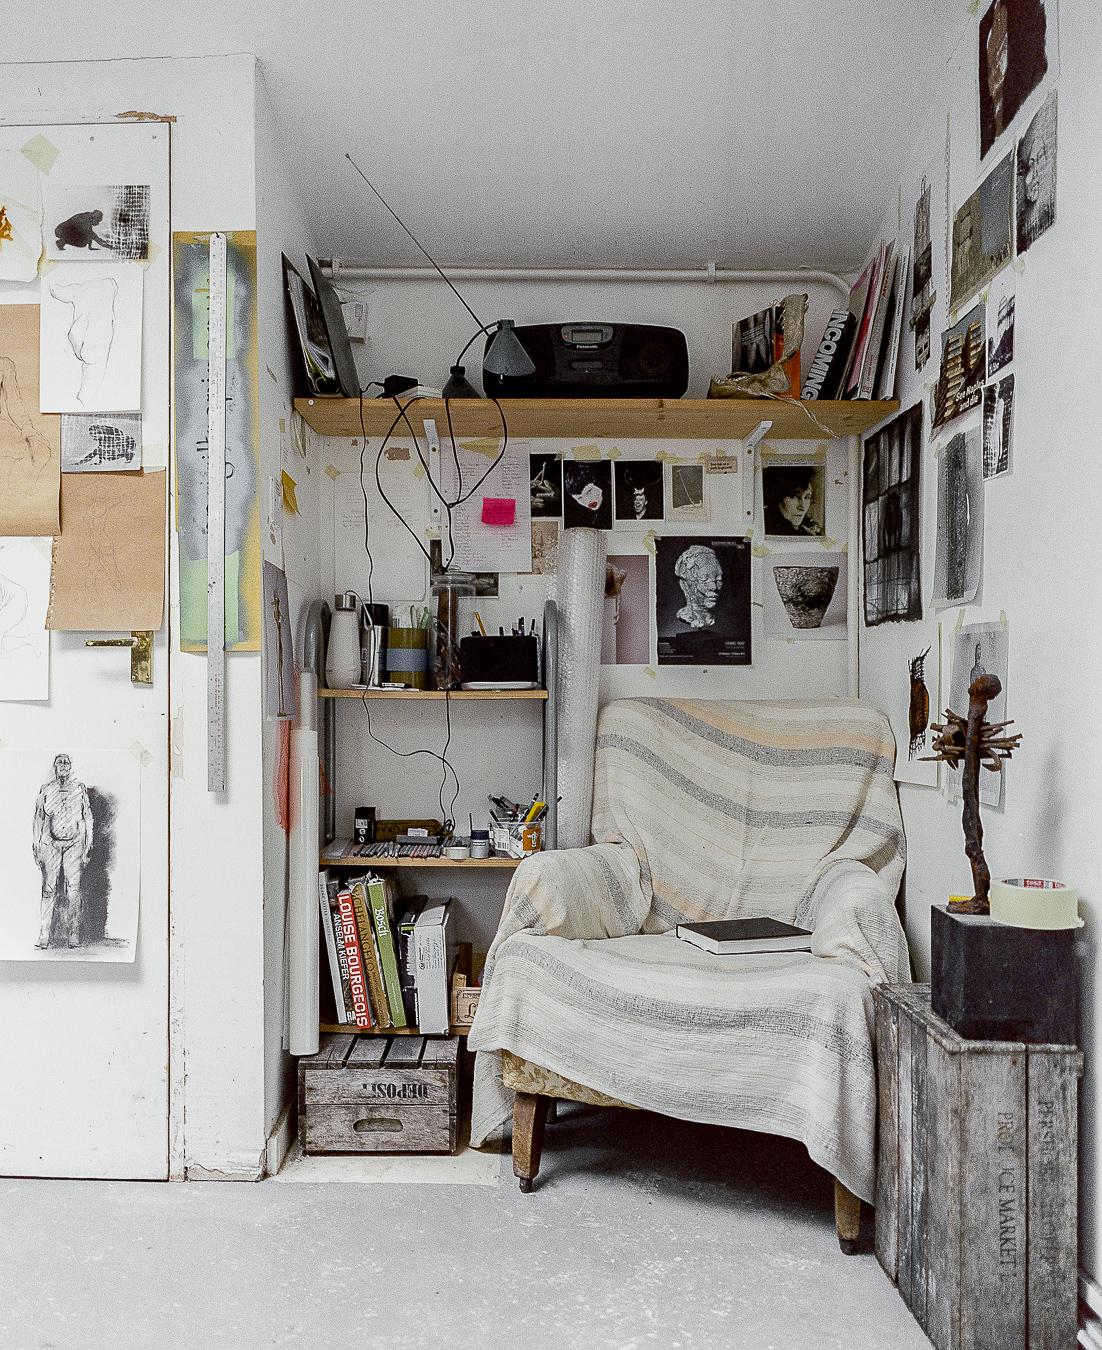 Studio Visit: Anna Gillespie - ARTVISIT...